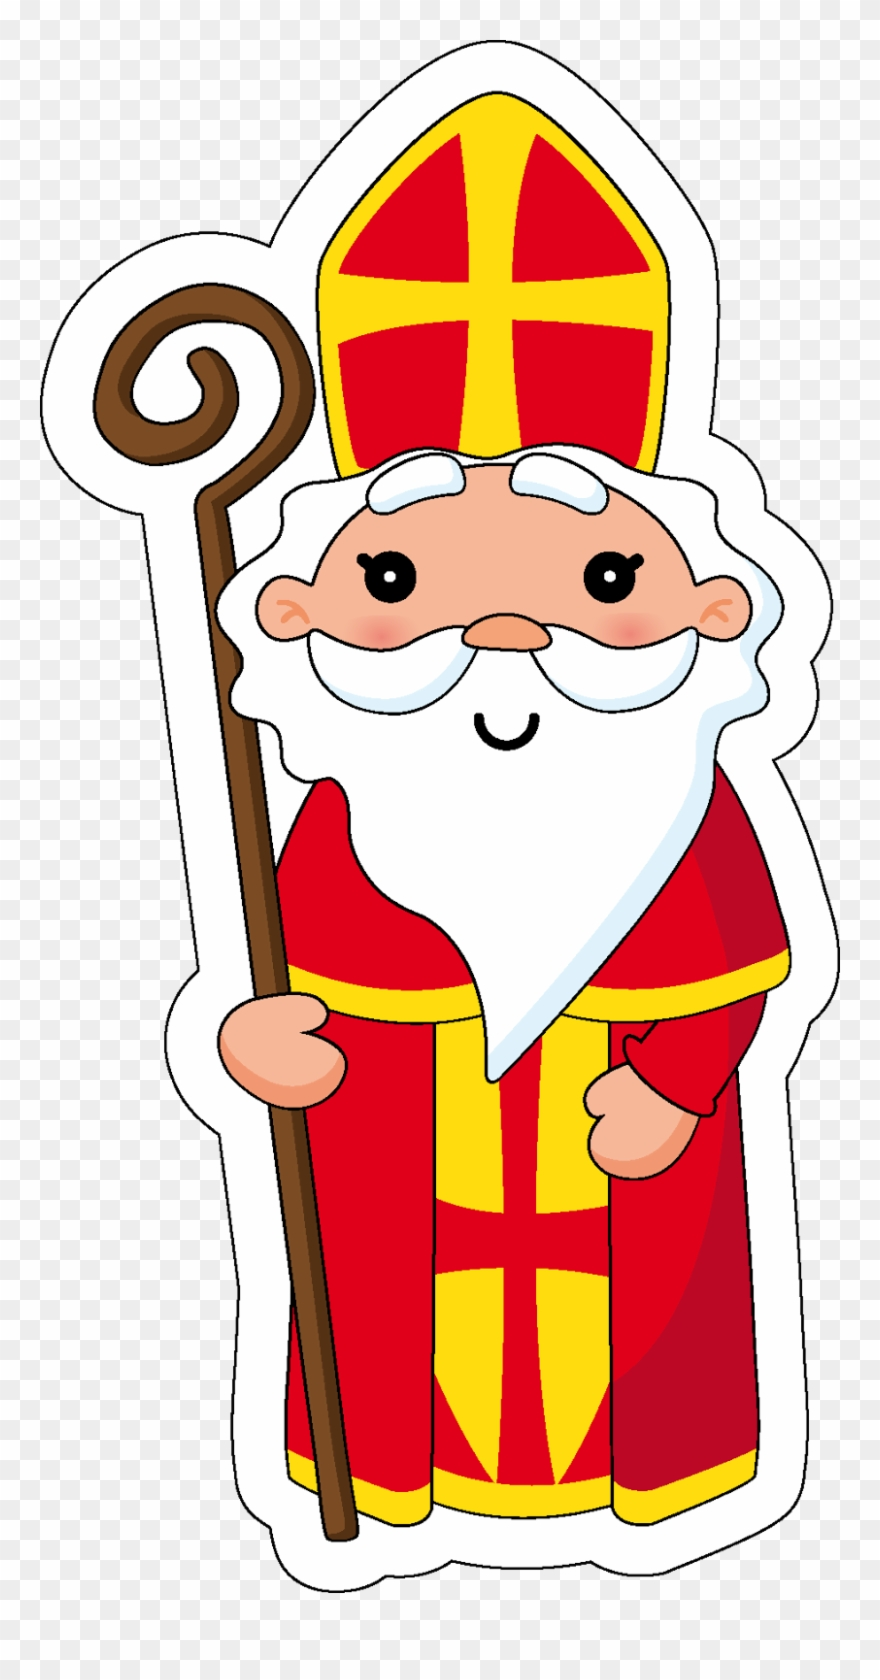 Clipart nikolaus clip royalty free stock Nikolaus Clipart - Png Download (#2723297) - PinClipart clip royalty free stock